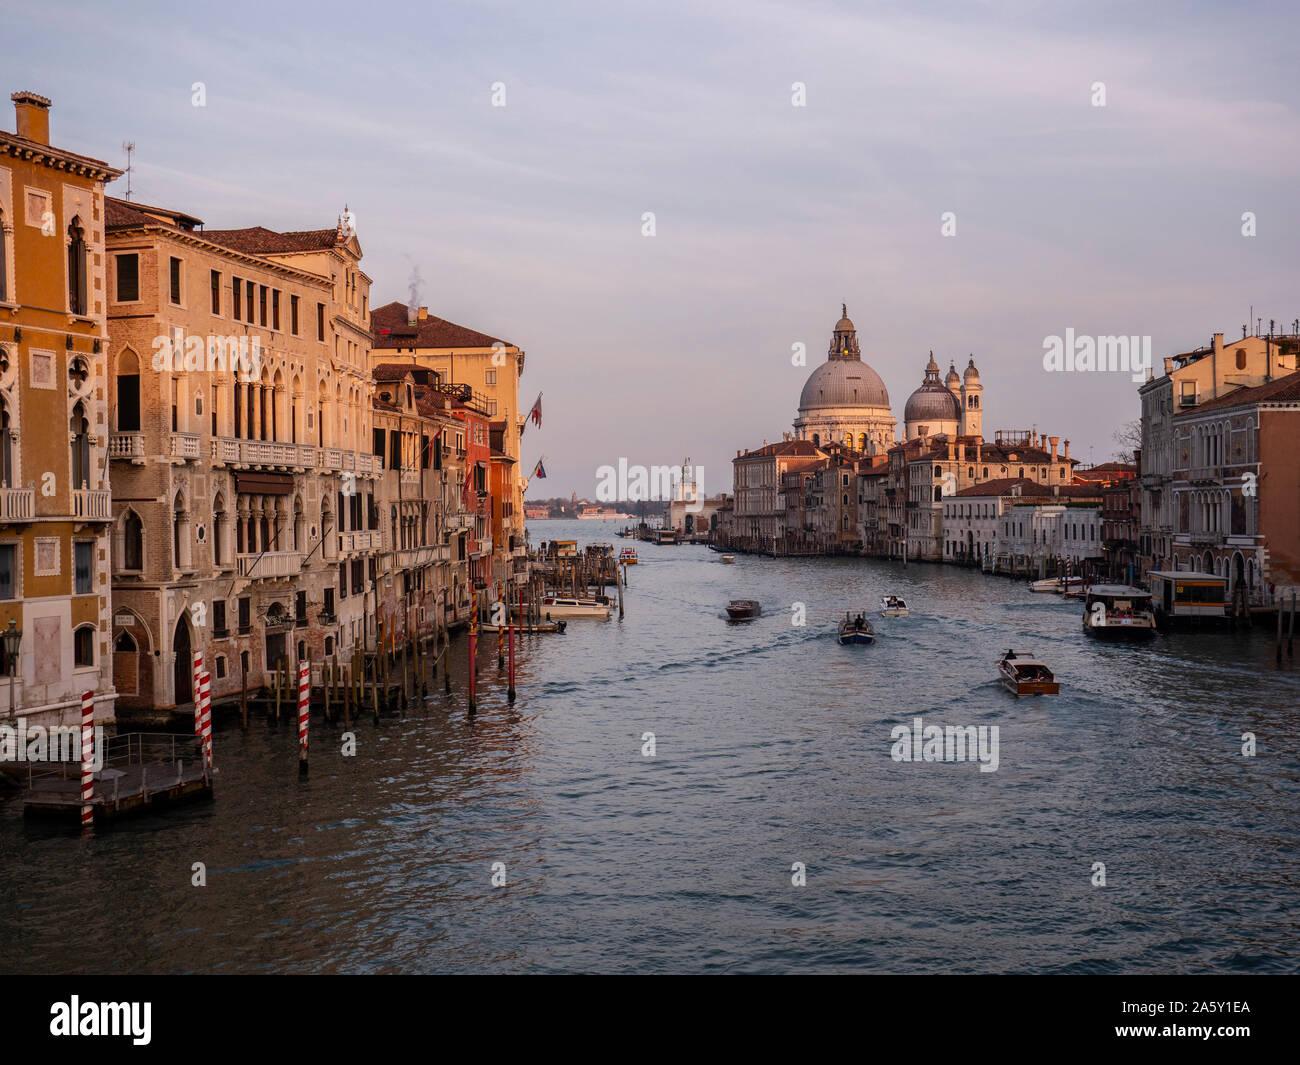 Italien, Veneto, Venedig, Basilika Santa Maria della Salute, Canal Grande Stockfoto